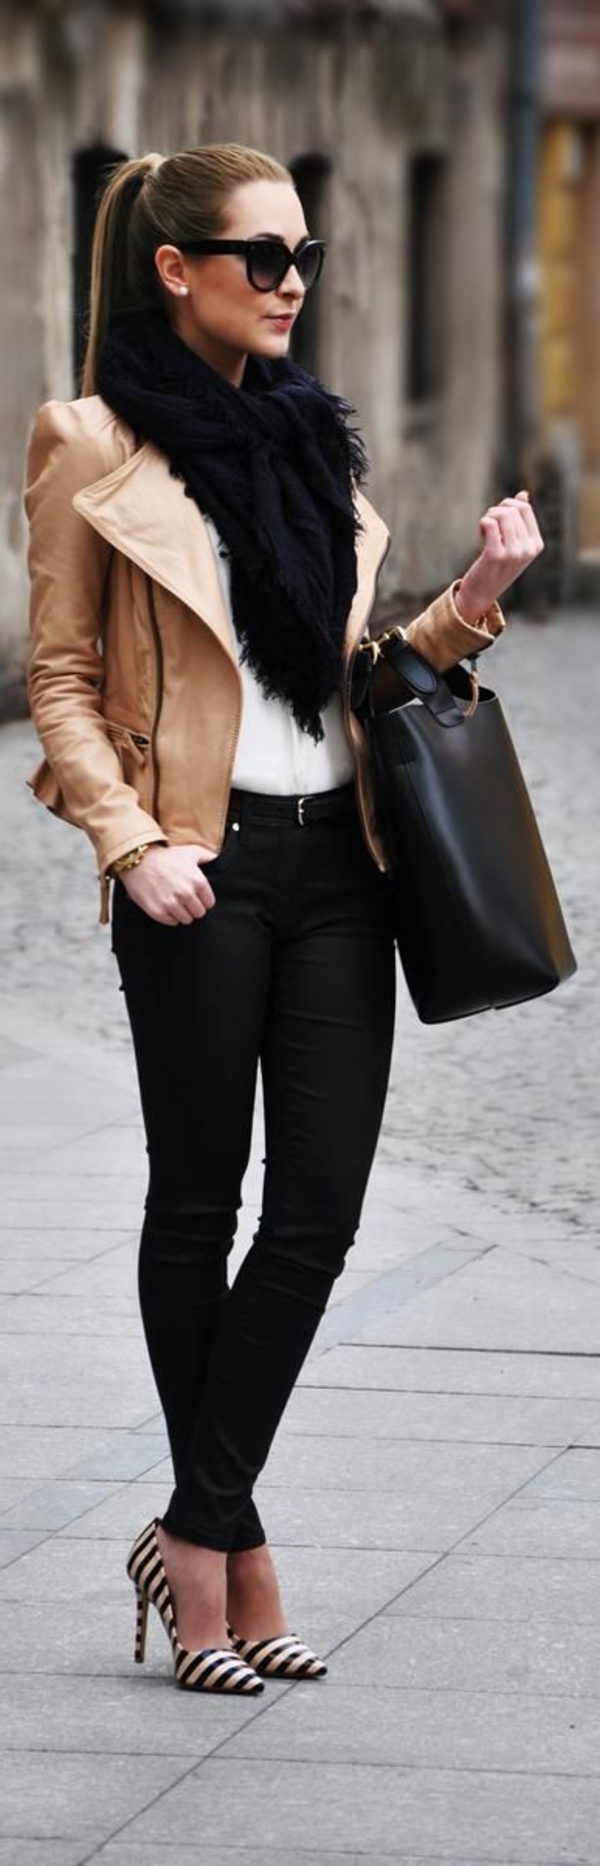 Blazer-en-cuir-tenue-spéciale-élégante-en-beige